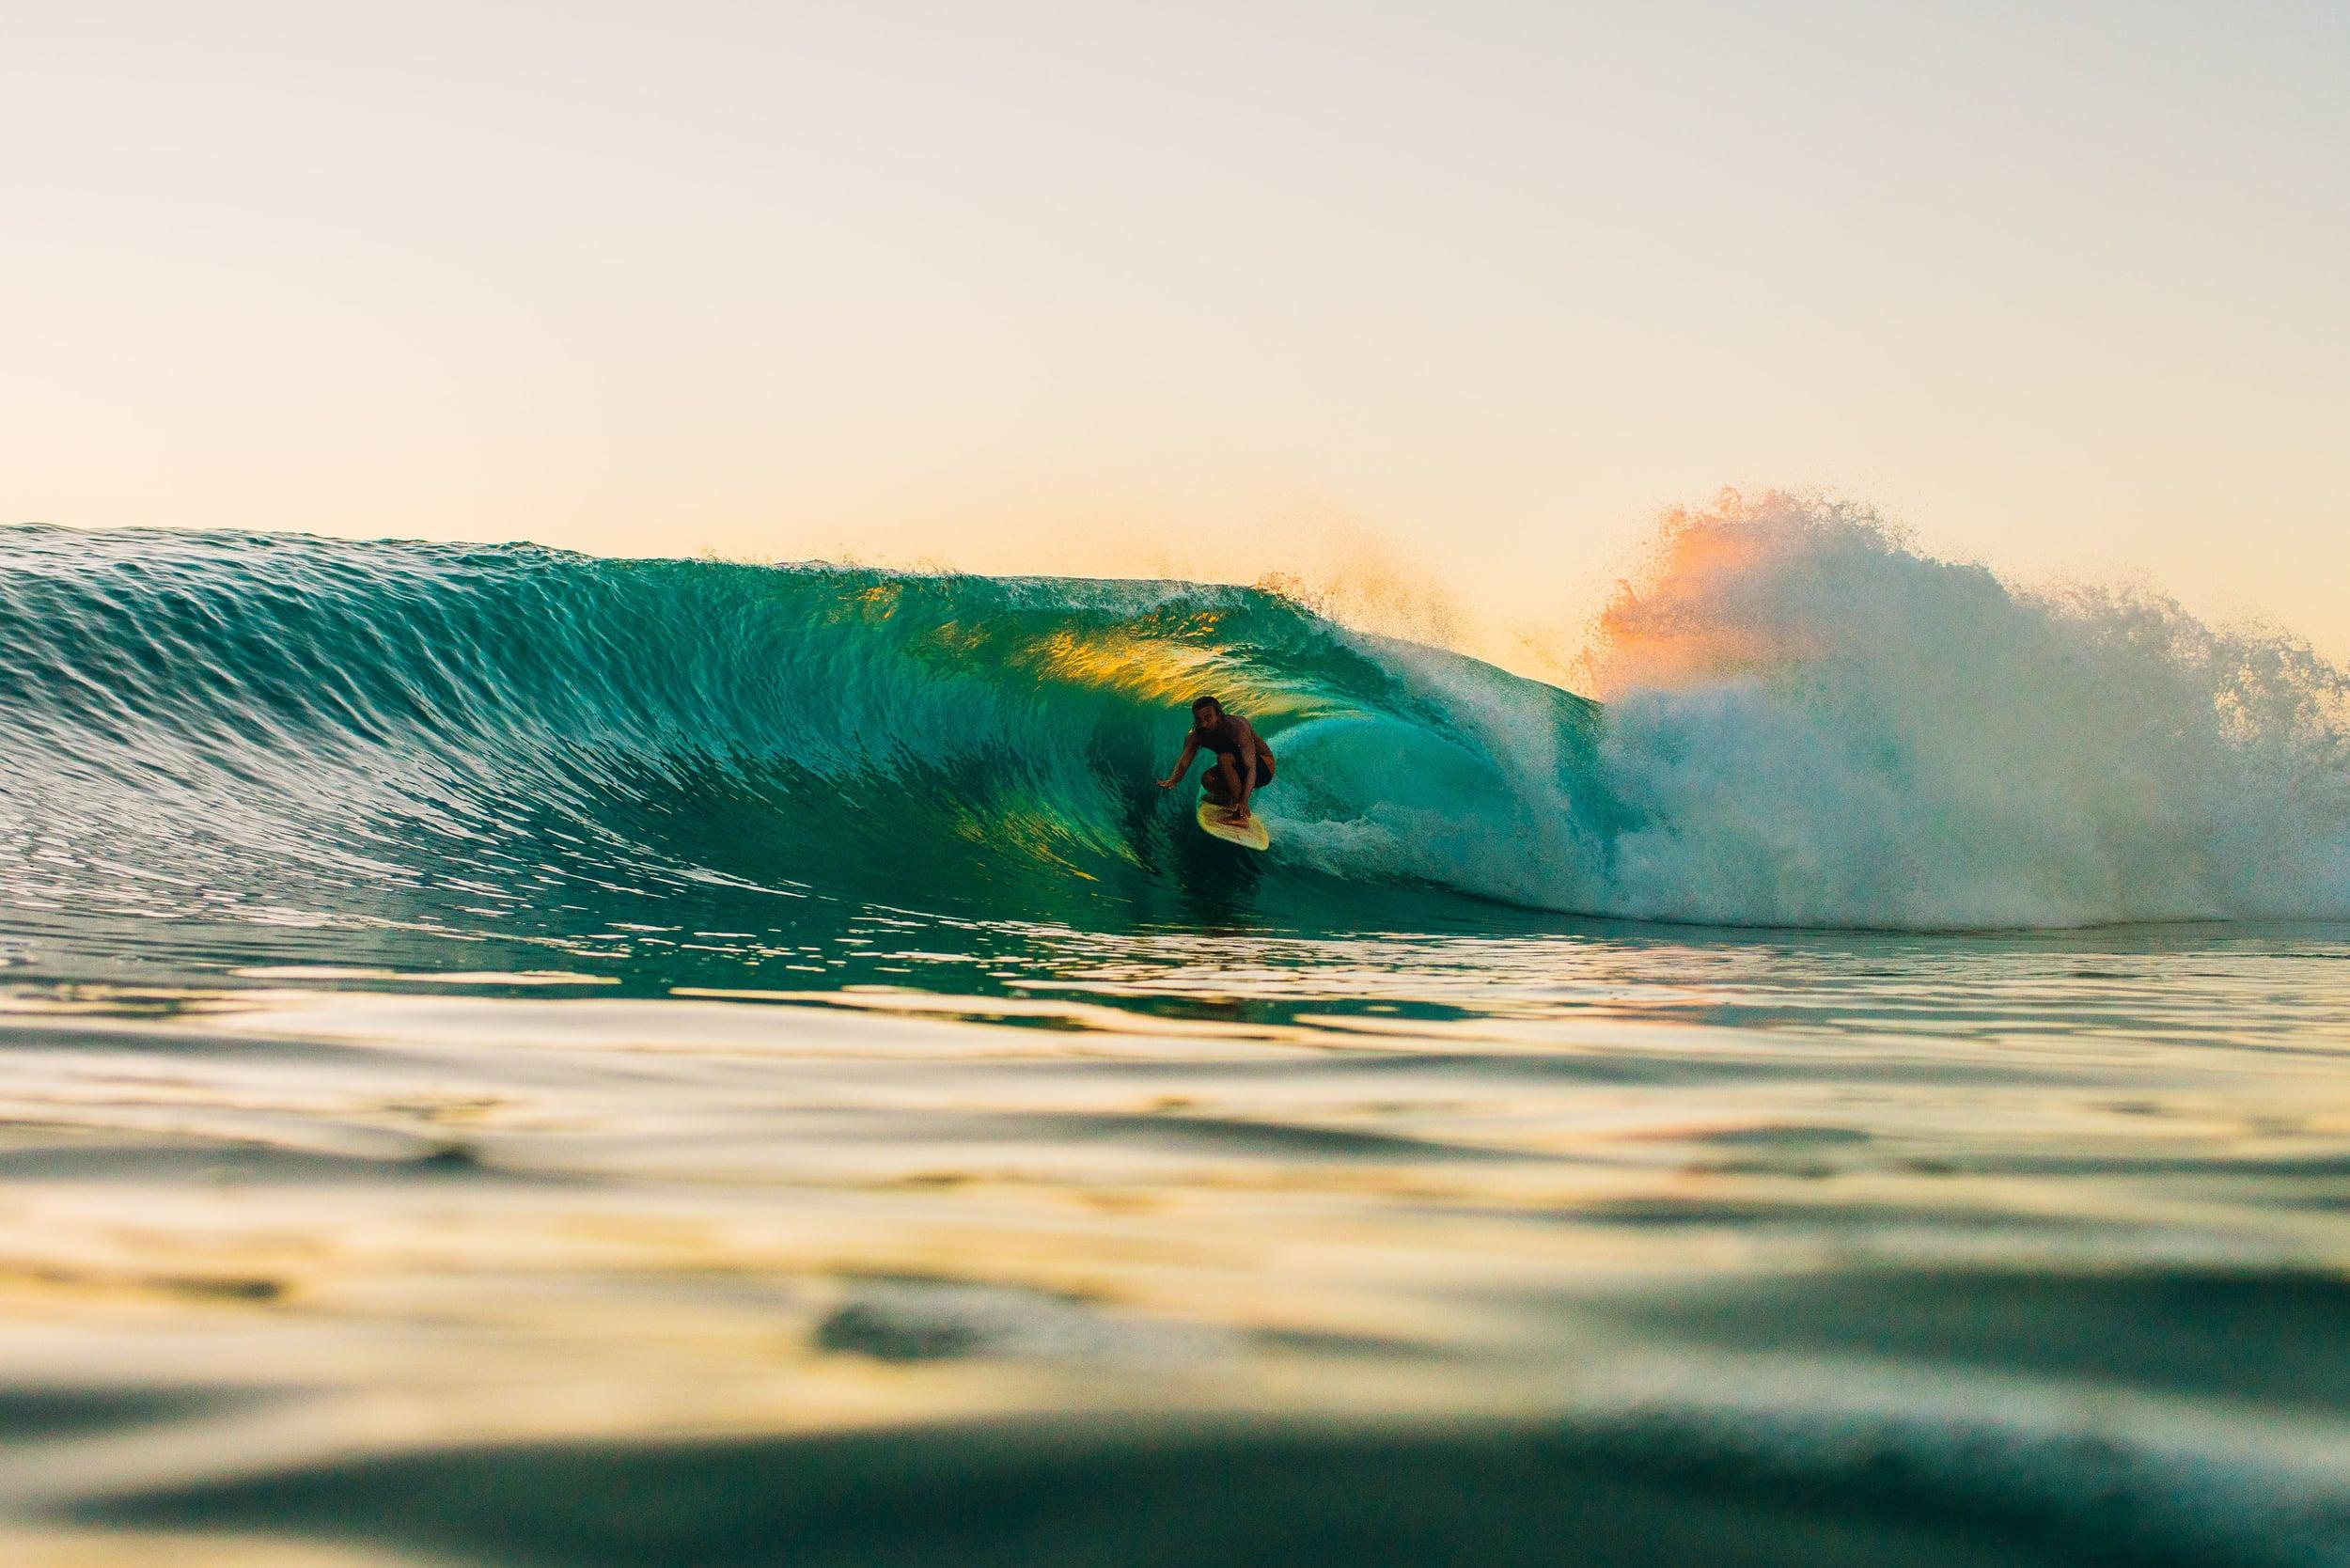 bryce-johnson-photography-kauai-hawaii-surfing-a7rii-aquatech-water-ocean-11.jpg